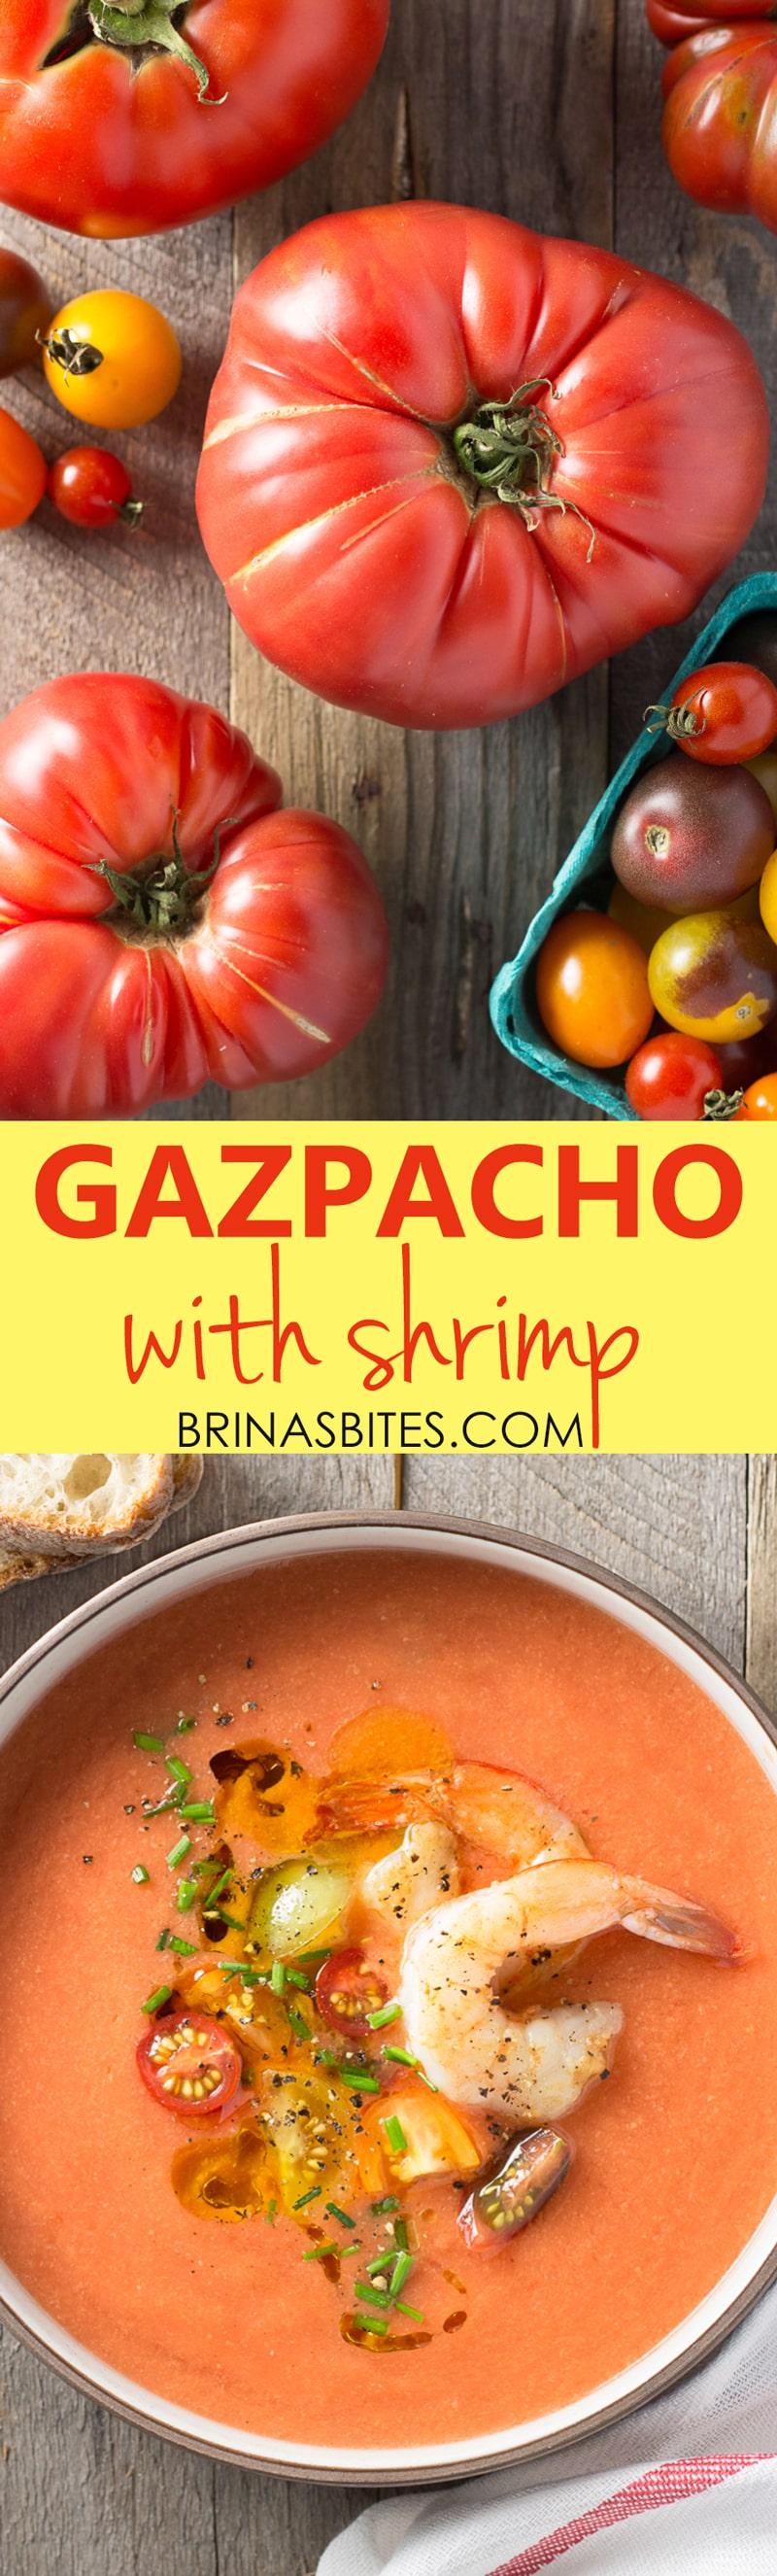 Gazpacho with Shrimp | Brinasbites.com @Brina's Bites